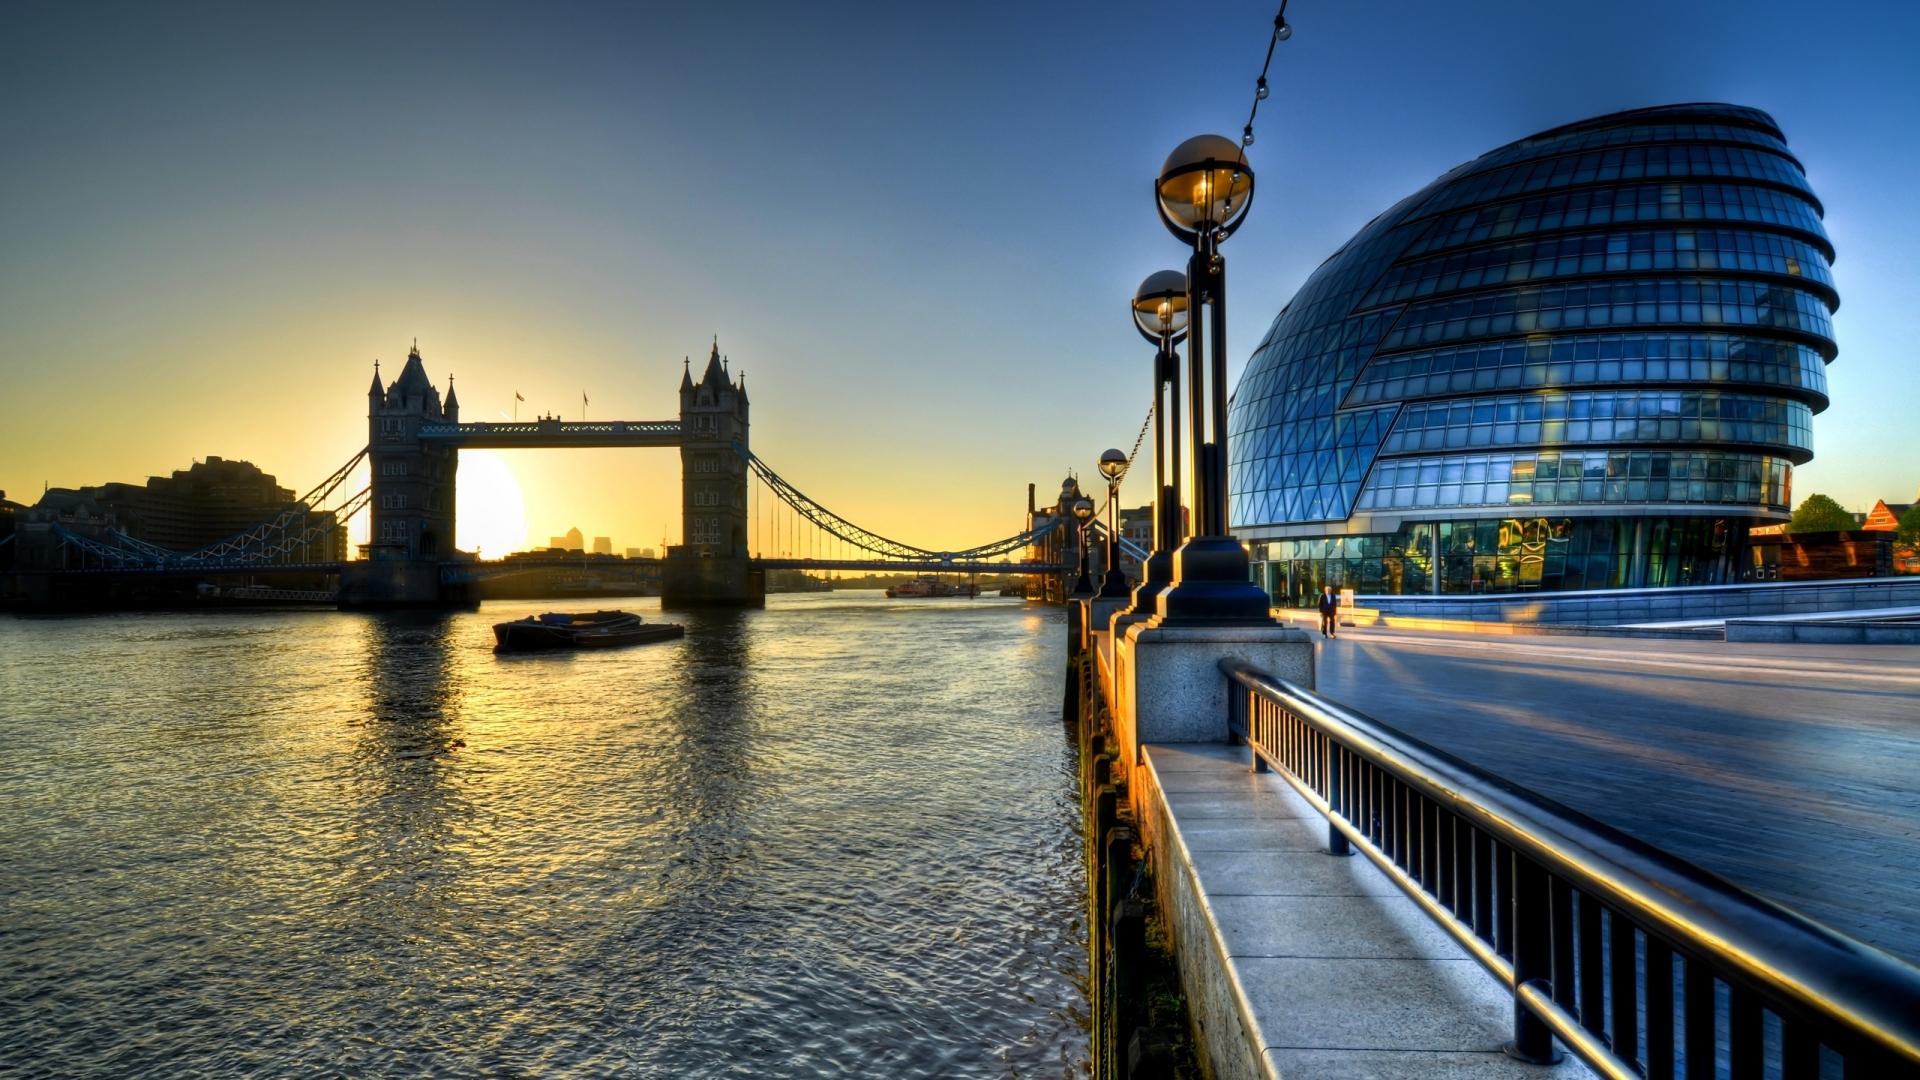 London Wallpapers HD bridge nice